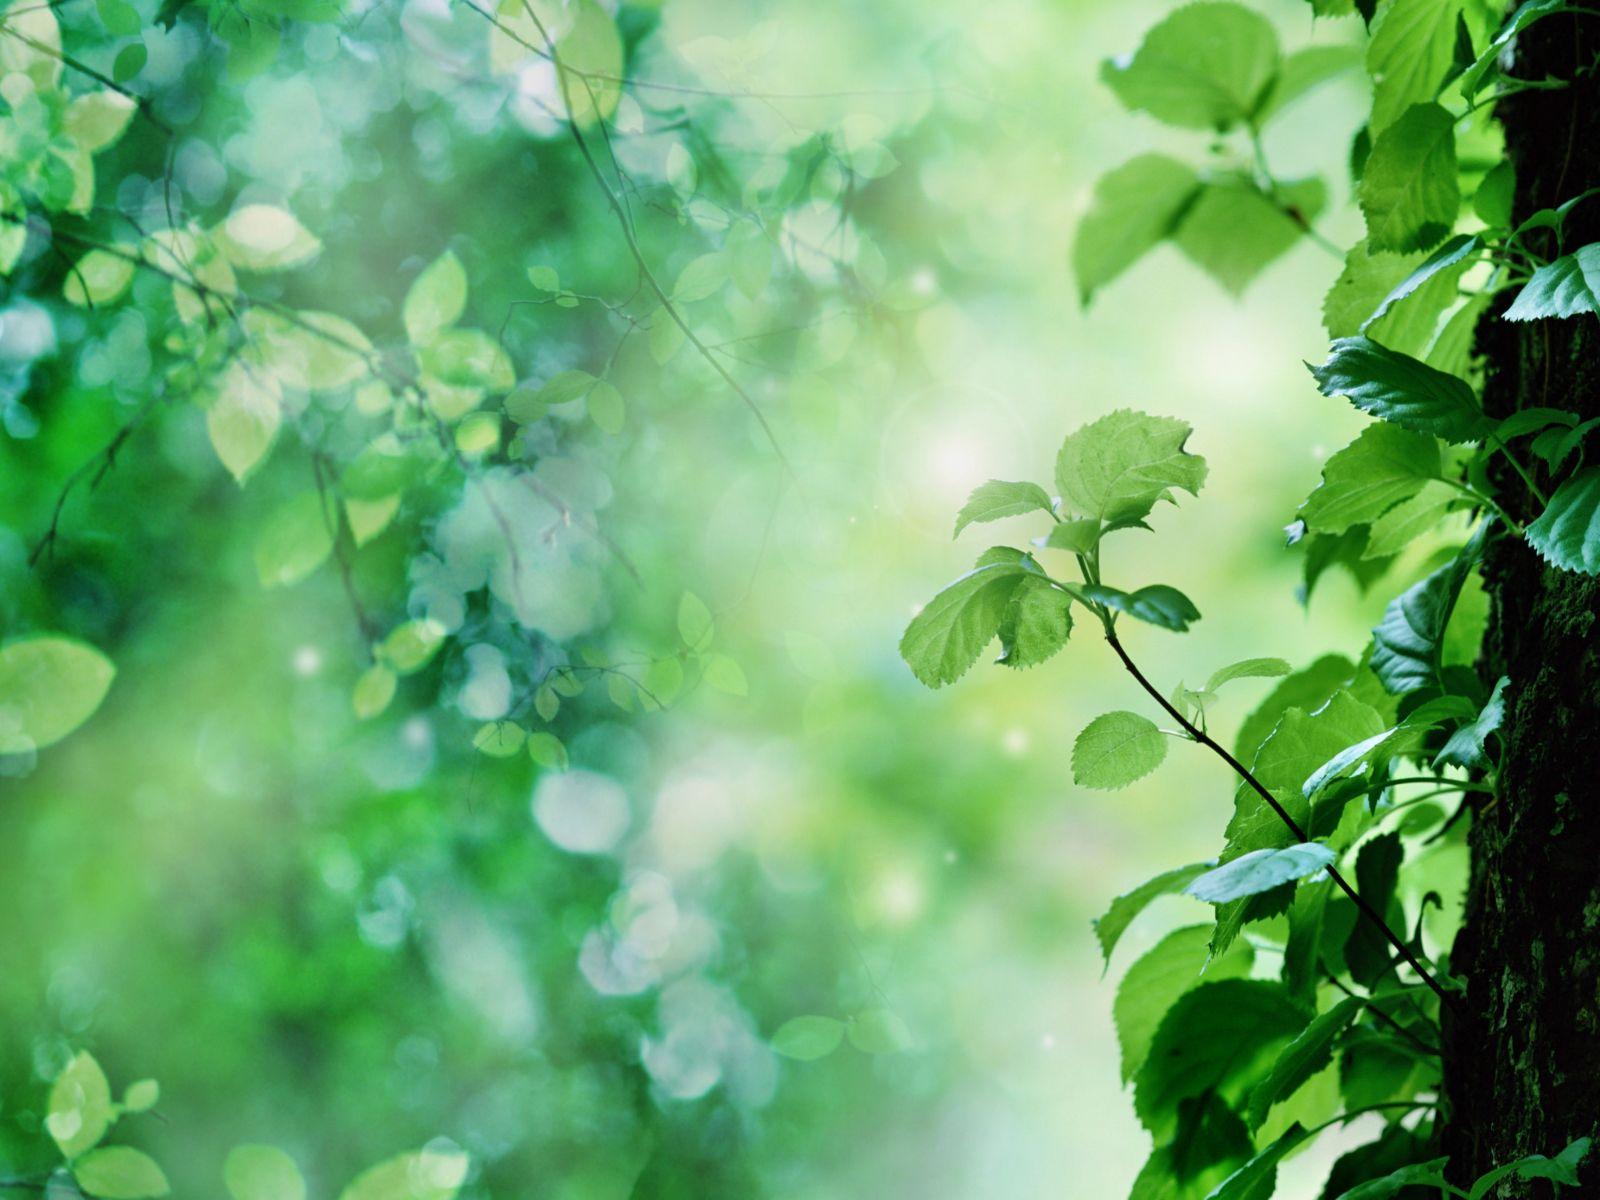 Leaf green nature leaves background wallpaper